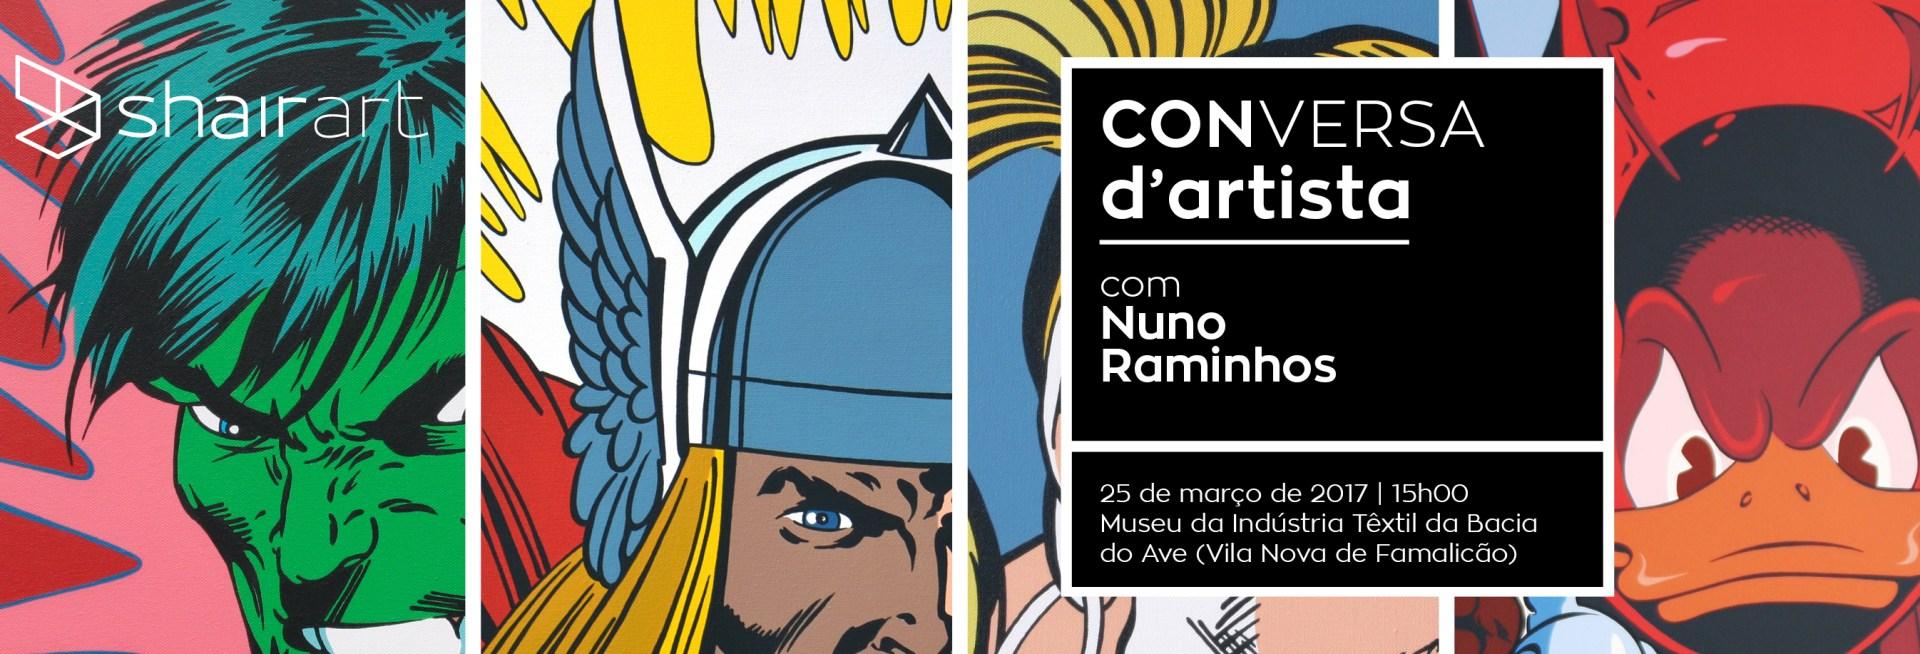 ODE TO THE SUPERHEROES by Nuno Raminhos